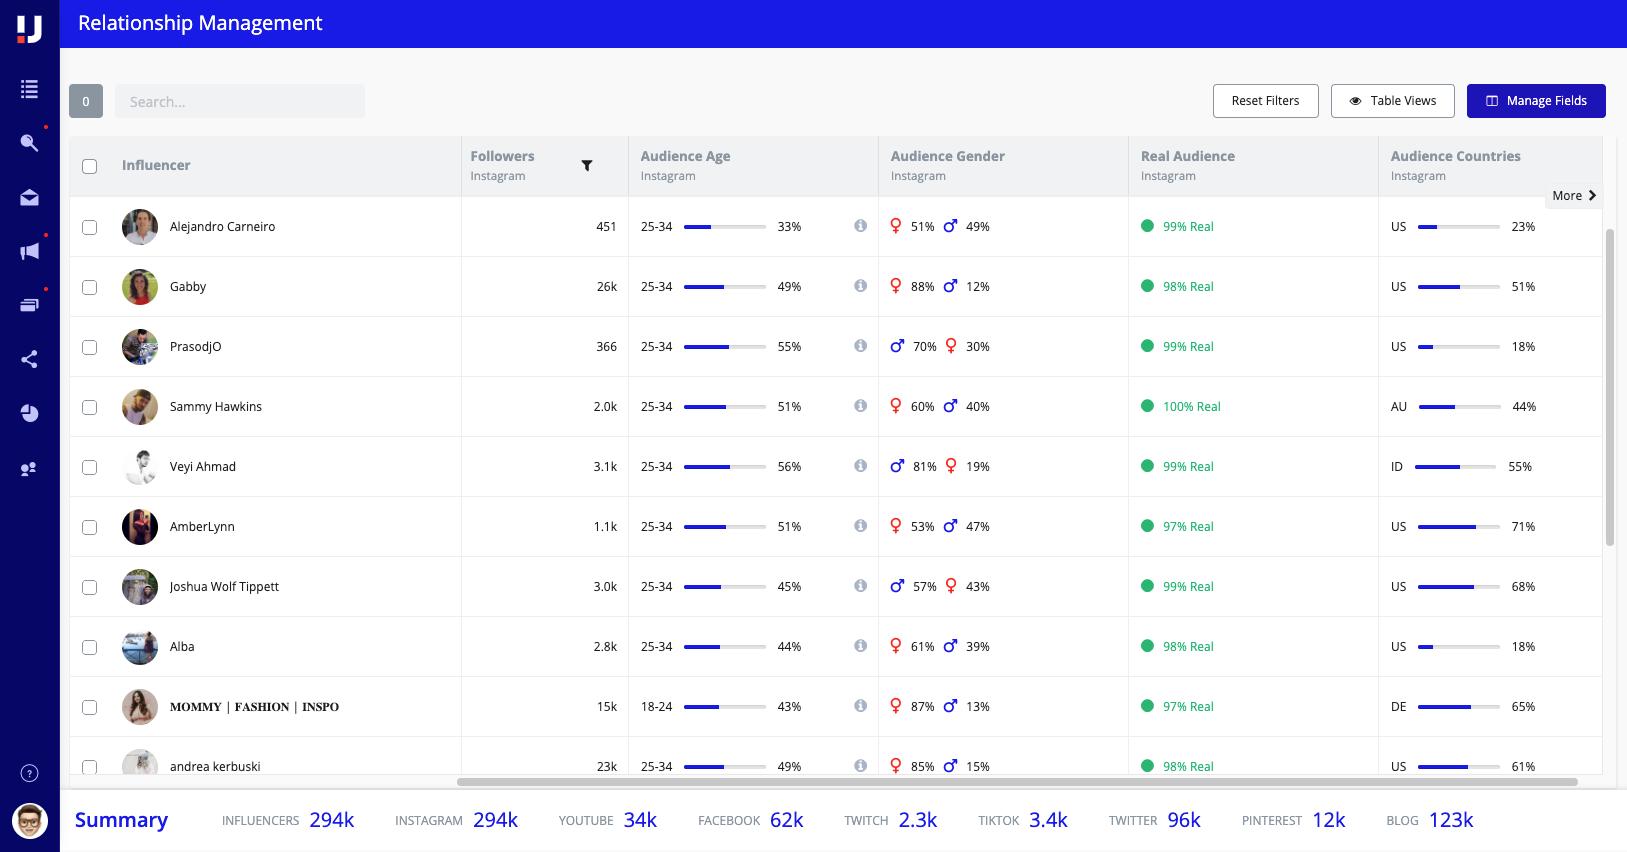 Upfluence Software - Influencer relationship management dashboard